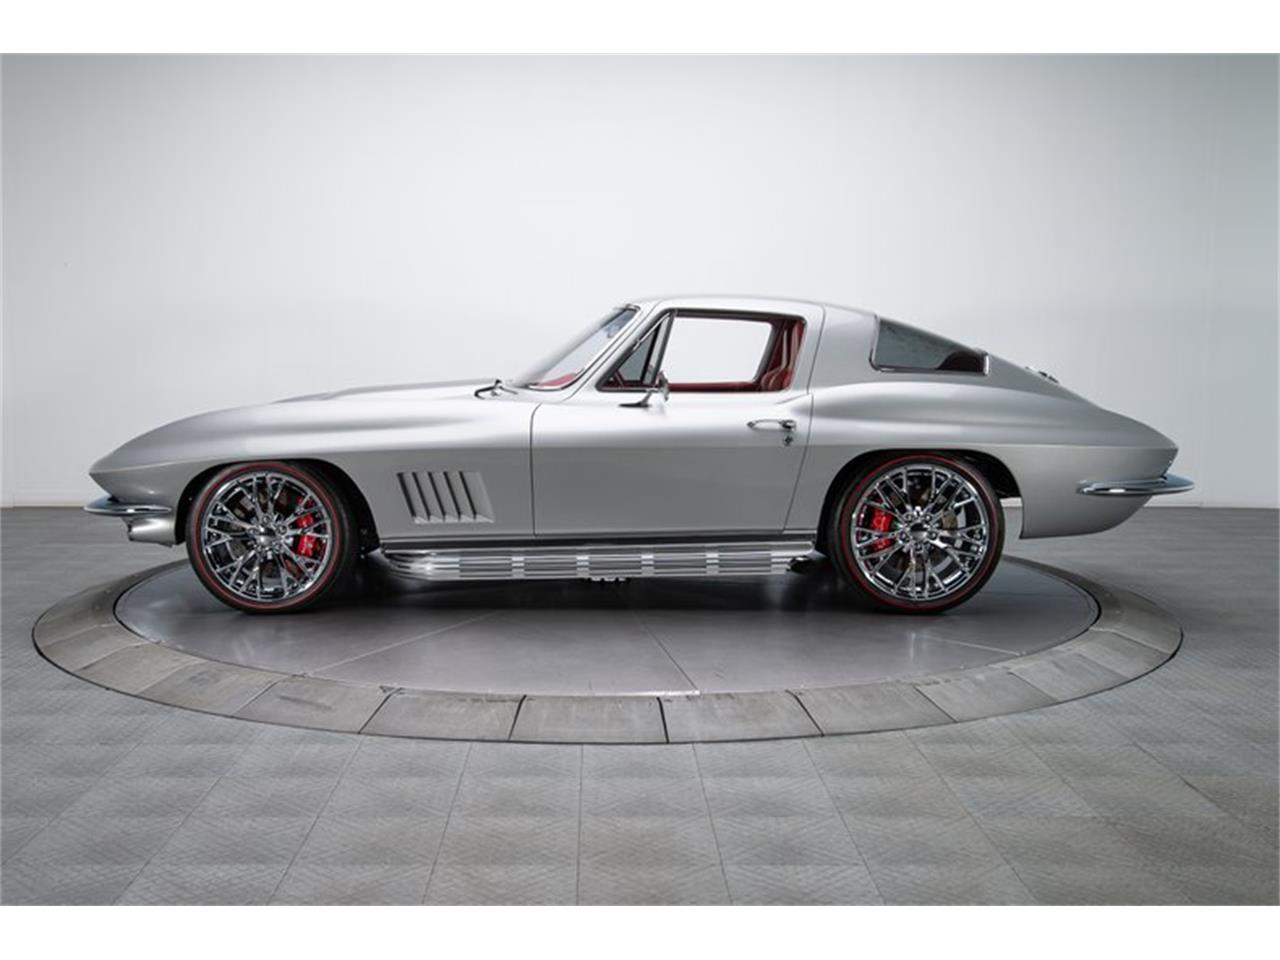 Large Picture of Classic '67 Chevrolet Corvette - $189,900.00 - Q4OM